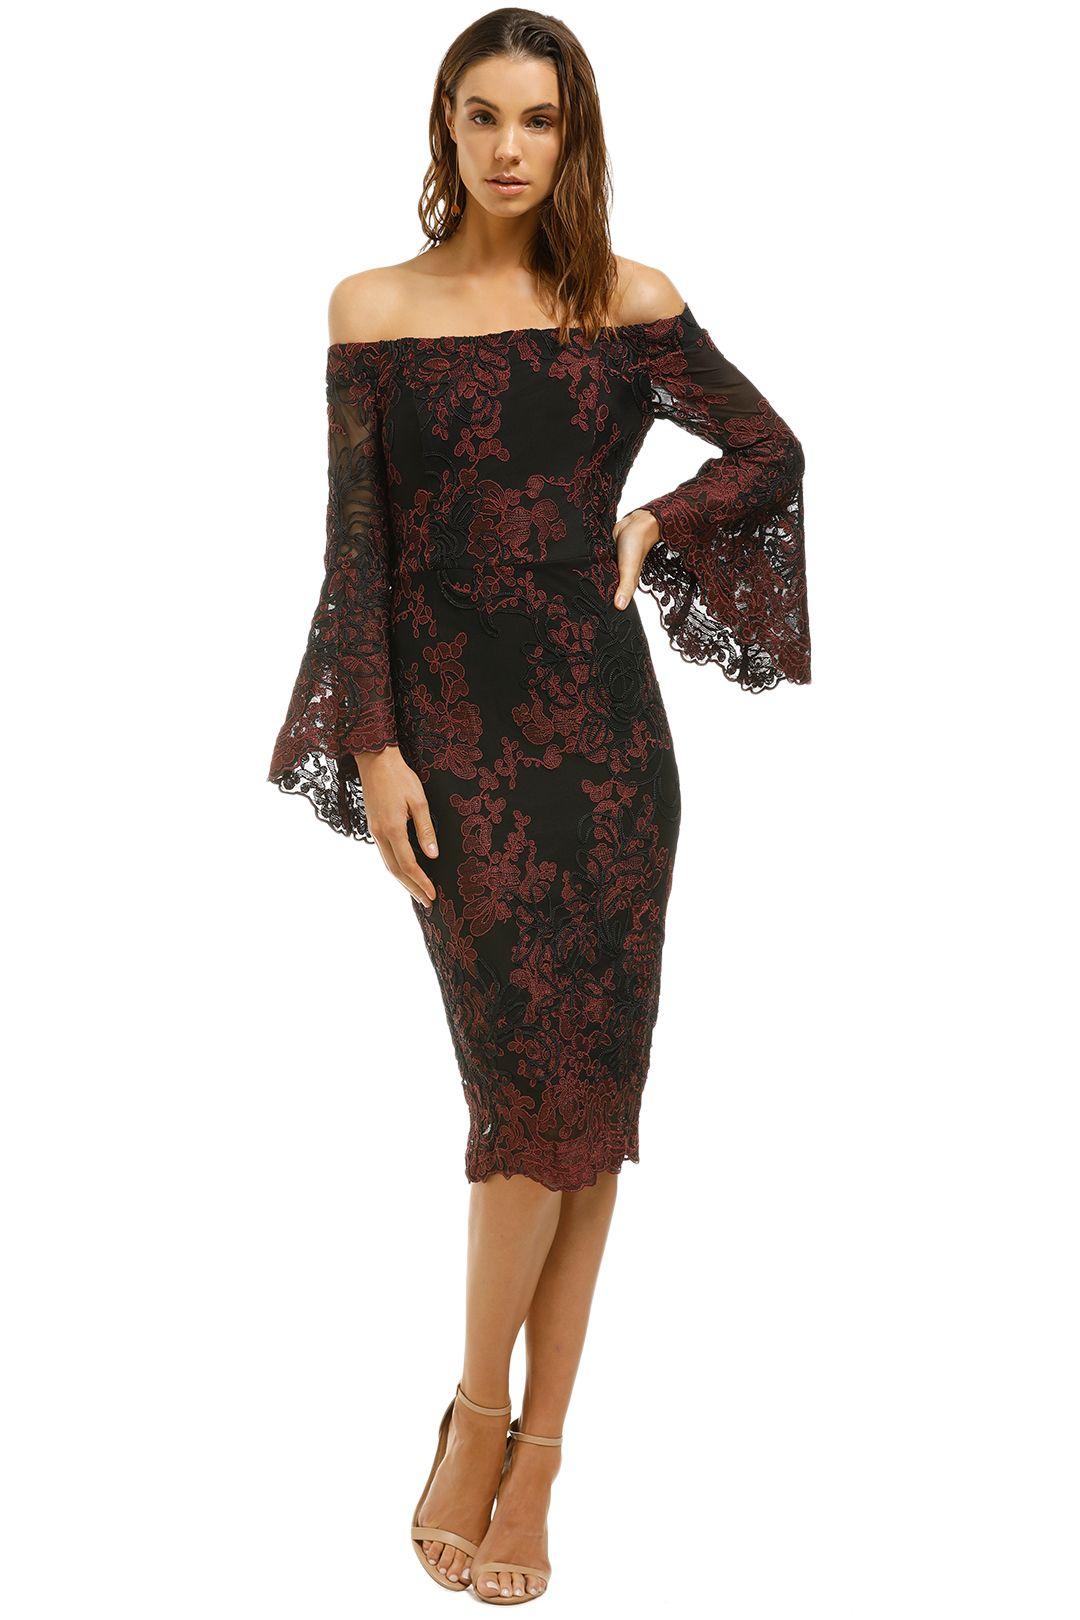 Montique - Stephanelle Lace Dress - Black Red -Front